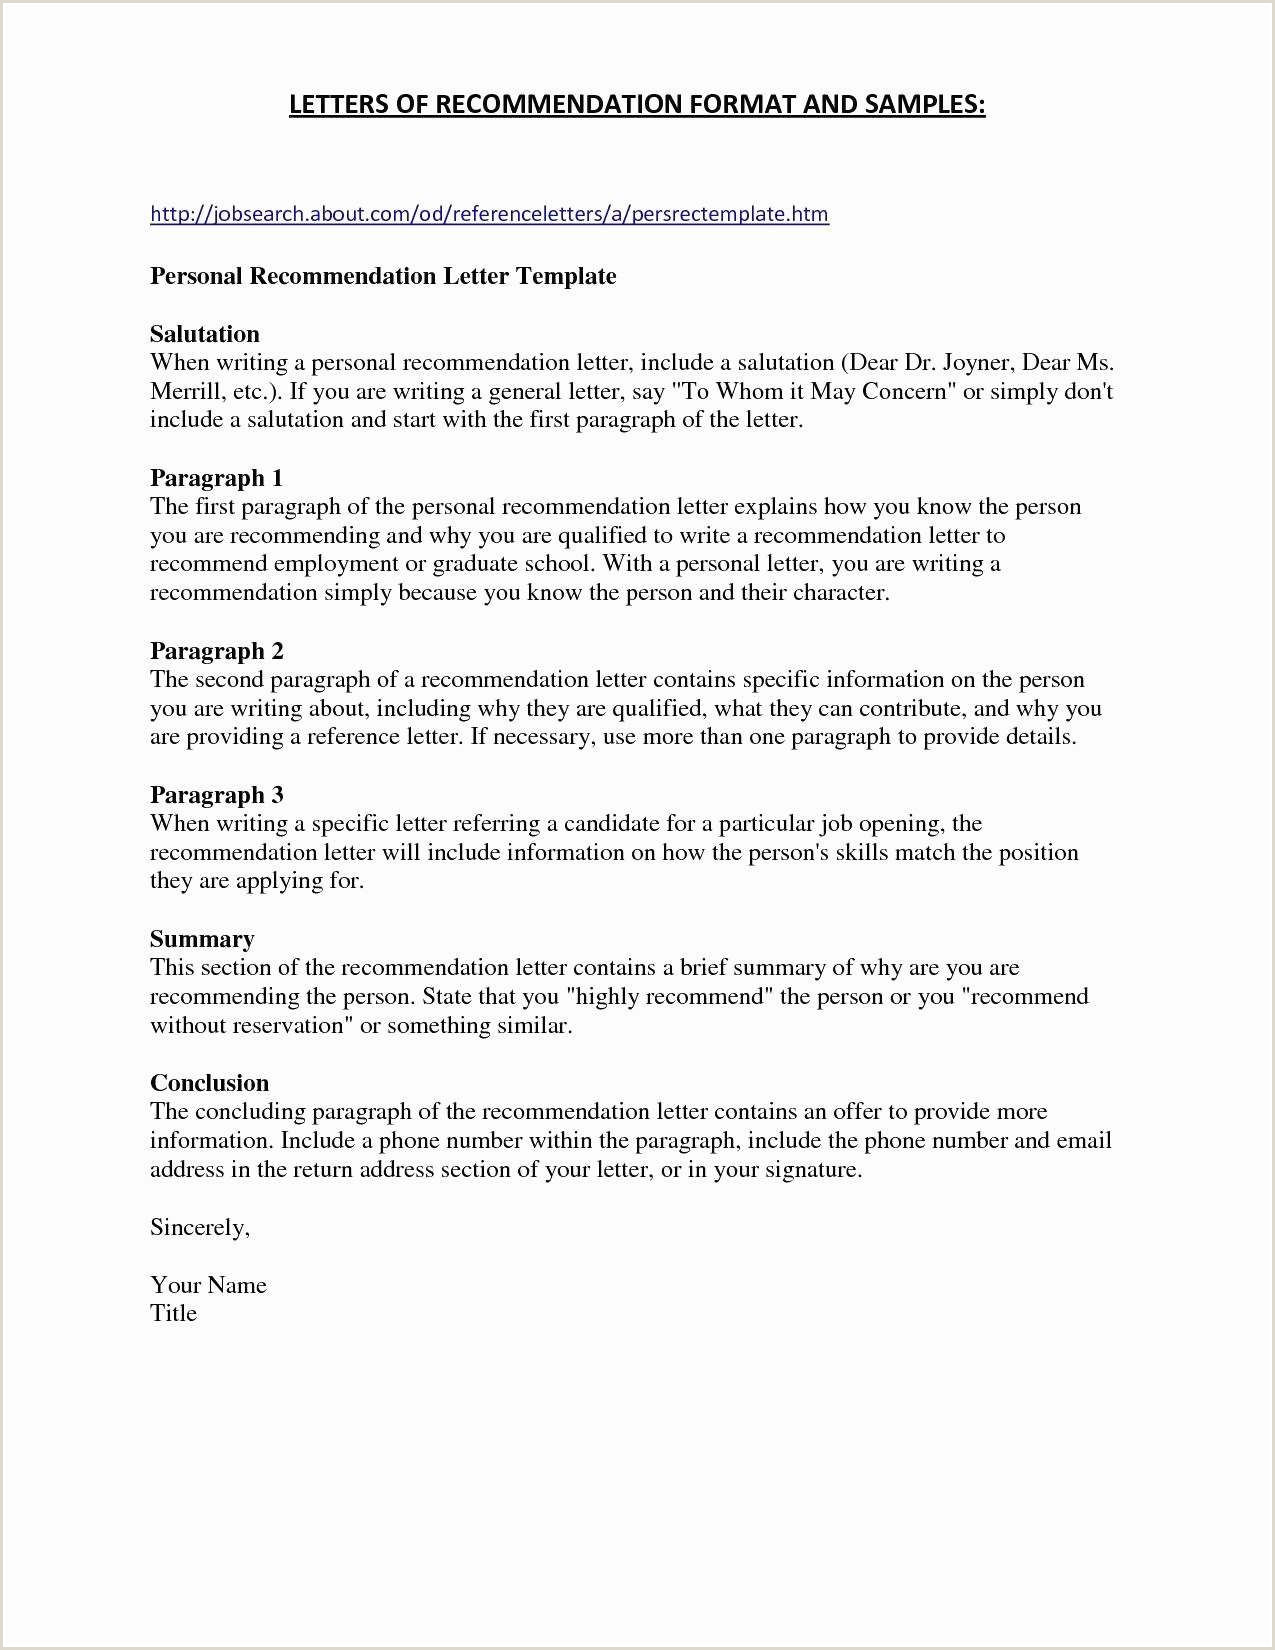 Curriculum Vitae Para Rellenar Modelos Esquema Curriculum Vitae Para Llenar Modelos De Resume